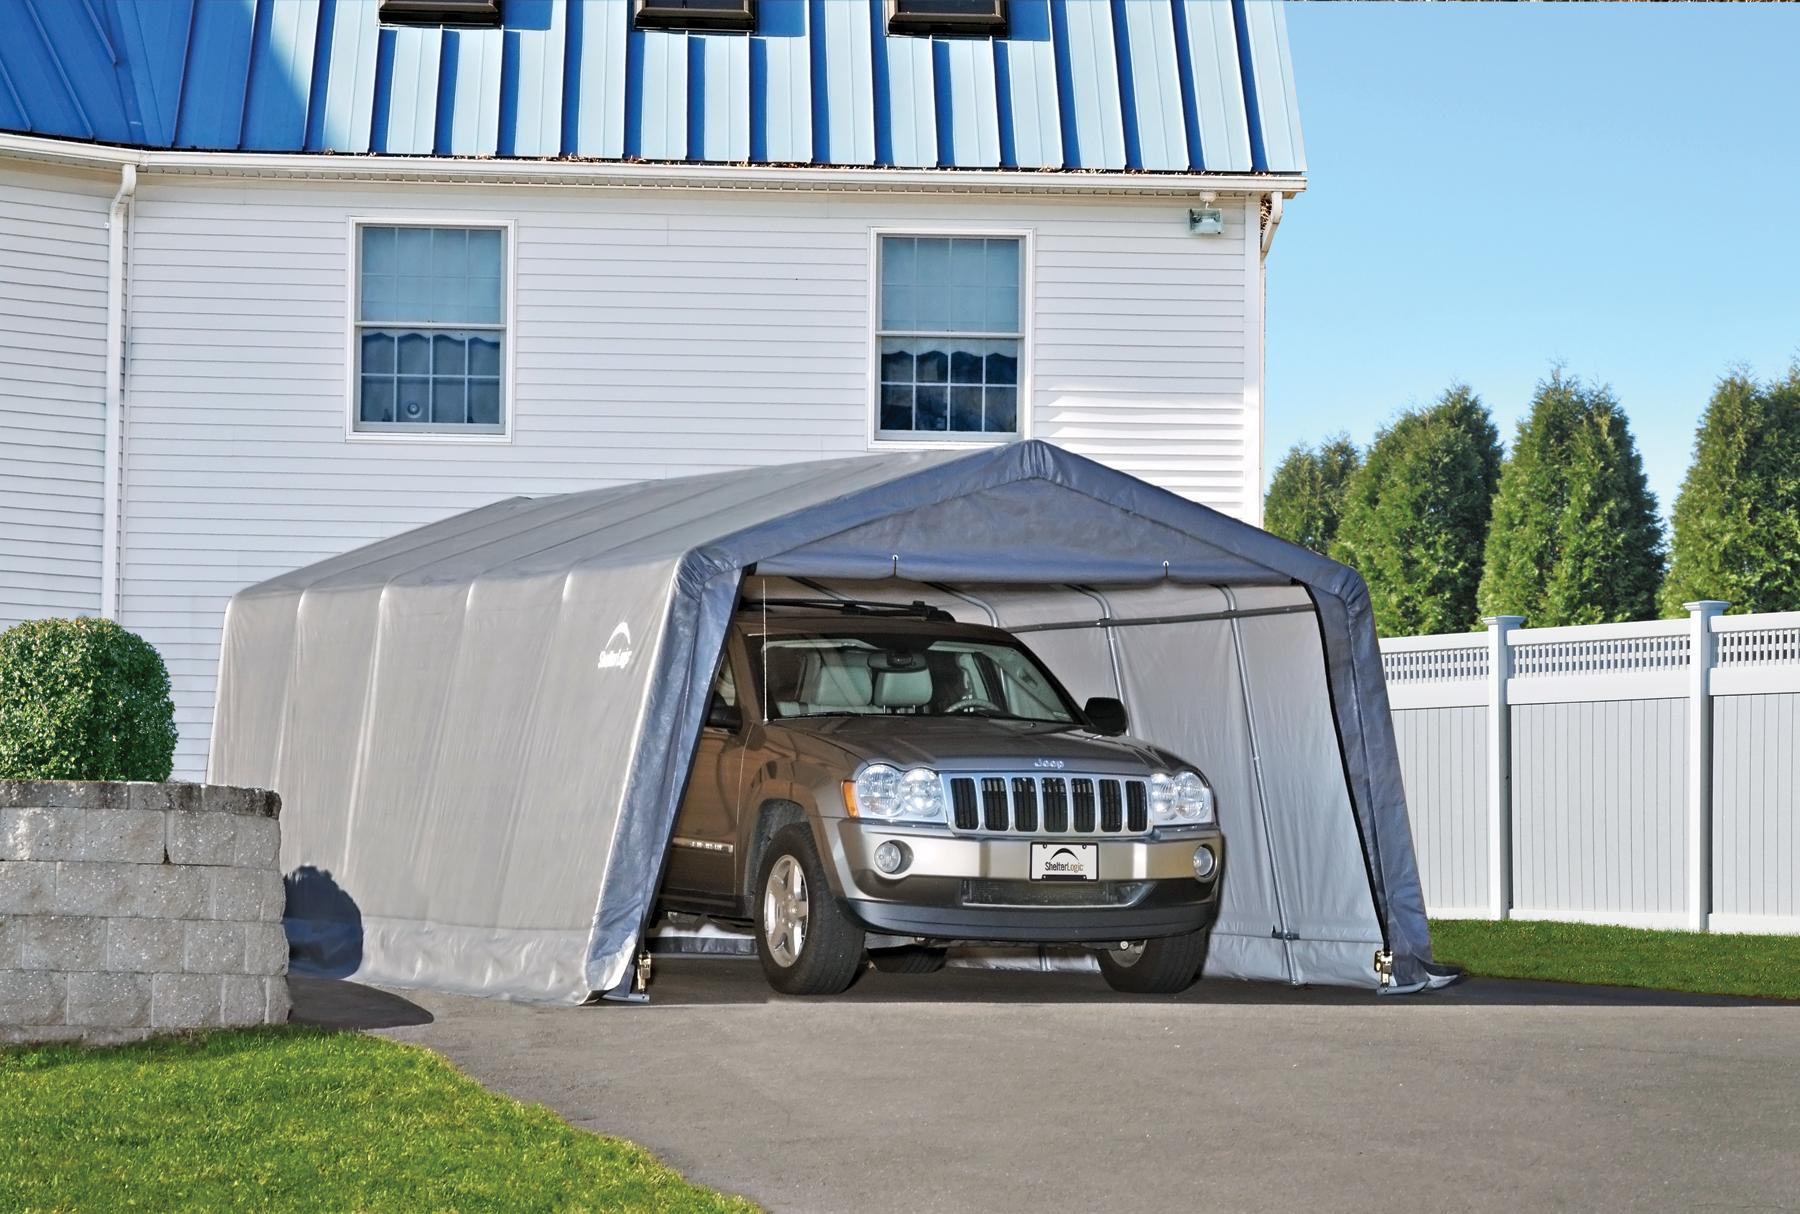 Portable Car Garage Portable Car Garage Shelter Costco: 301 Moved Permanently